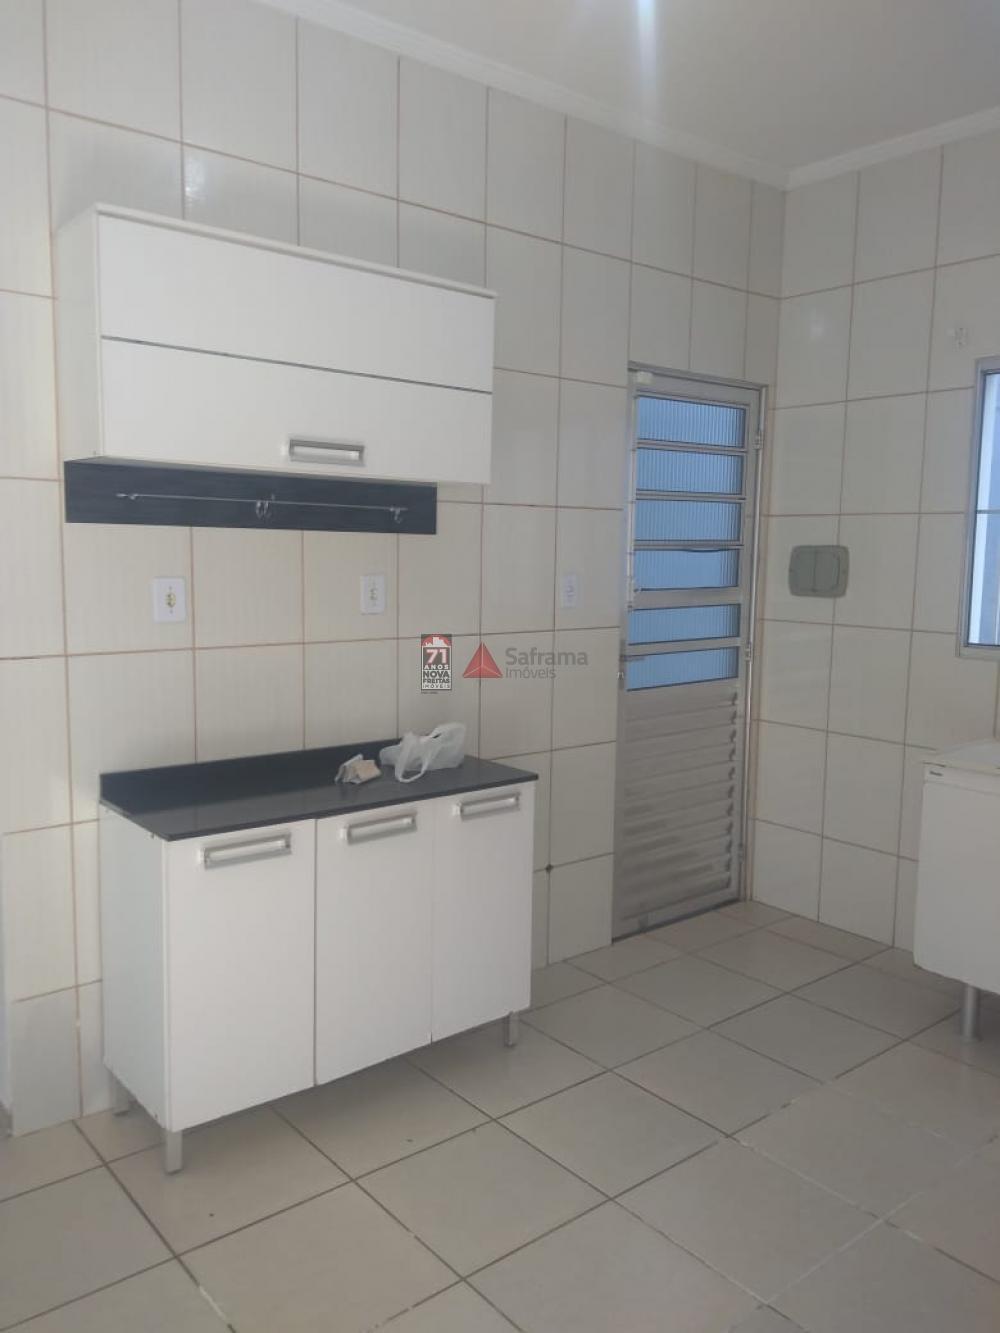 Alugar Casa / Padrão em Pindamonhangaba R$ 700,00 - Foto 7